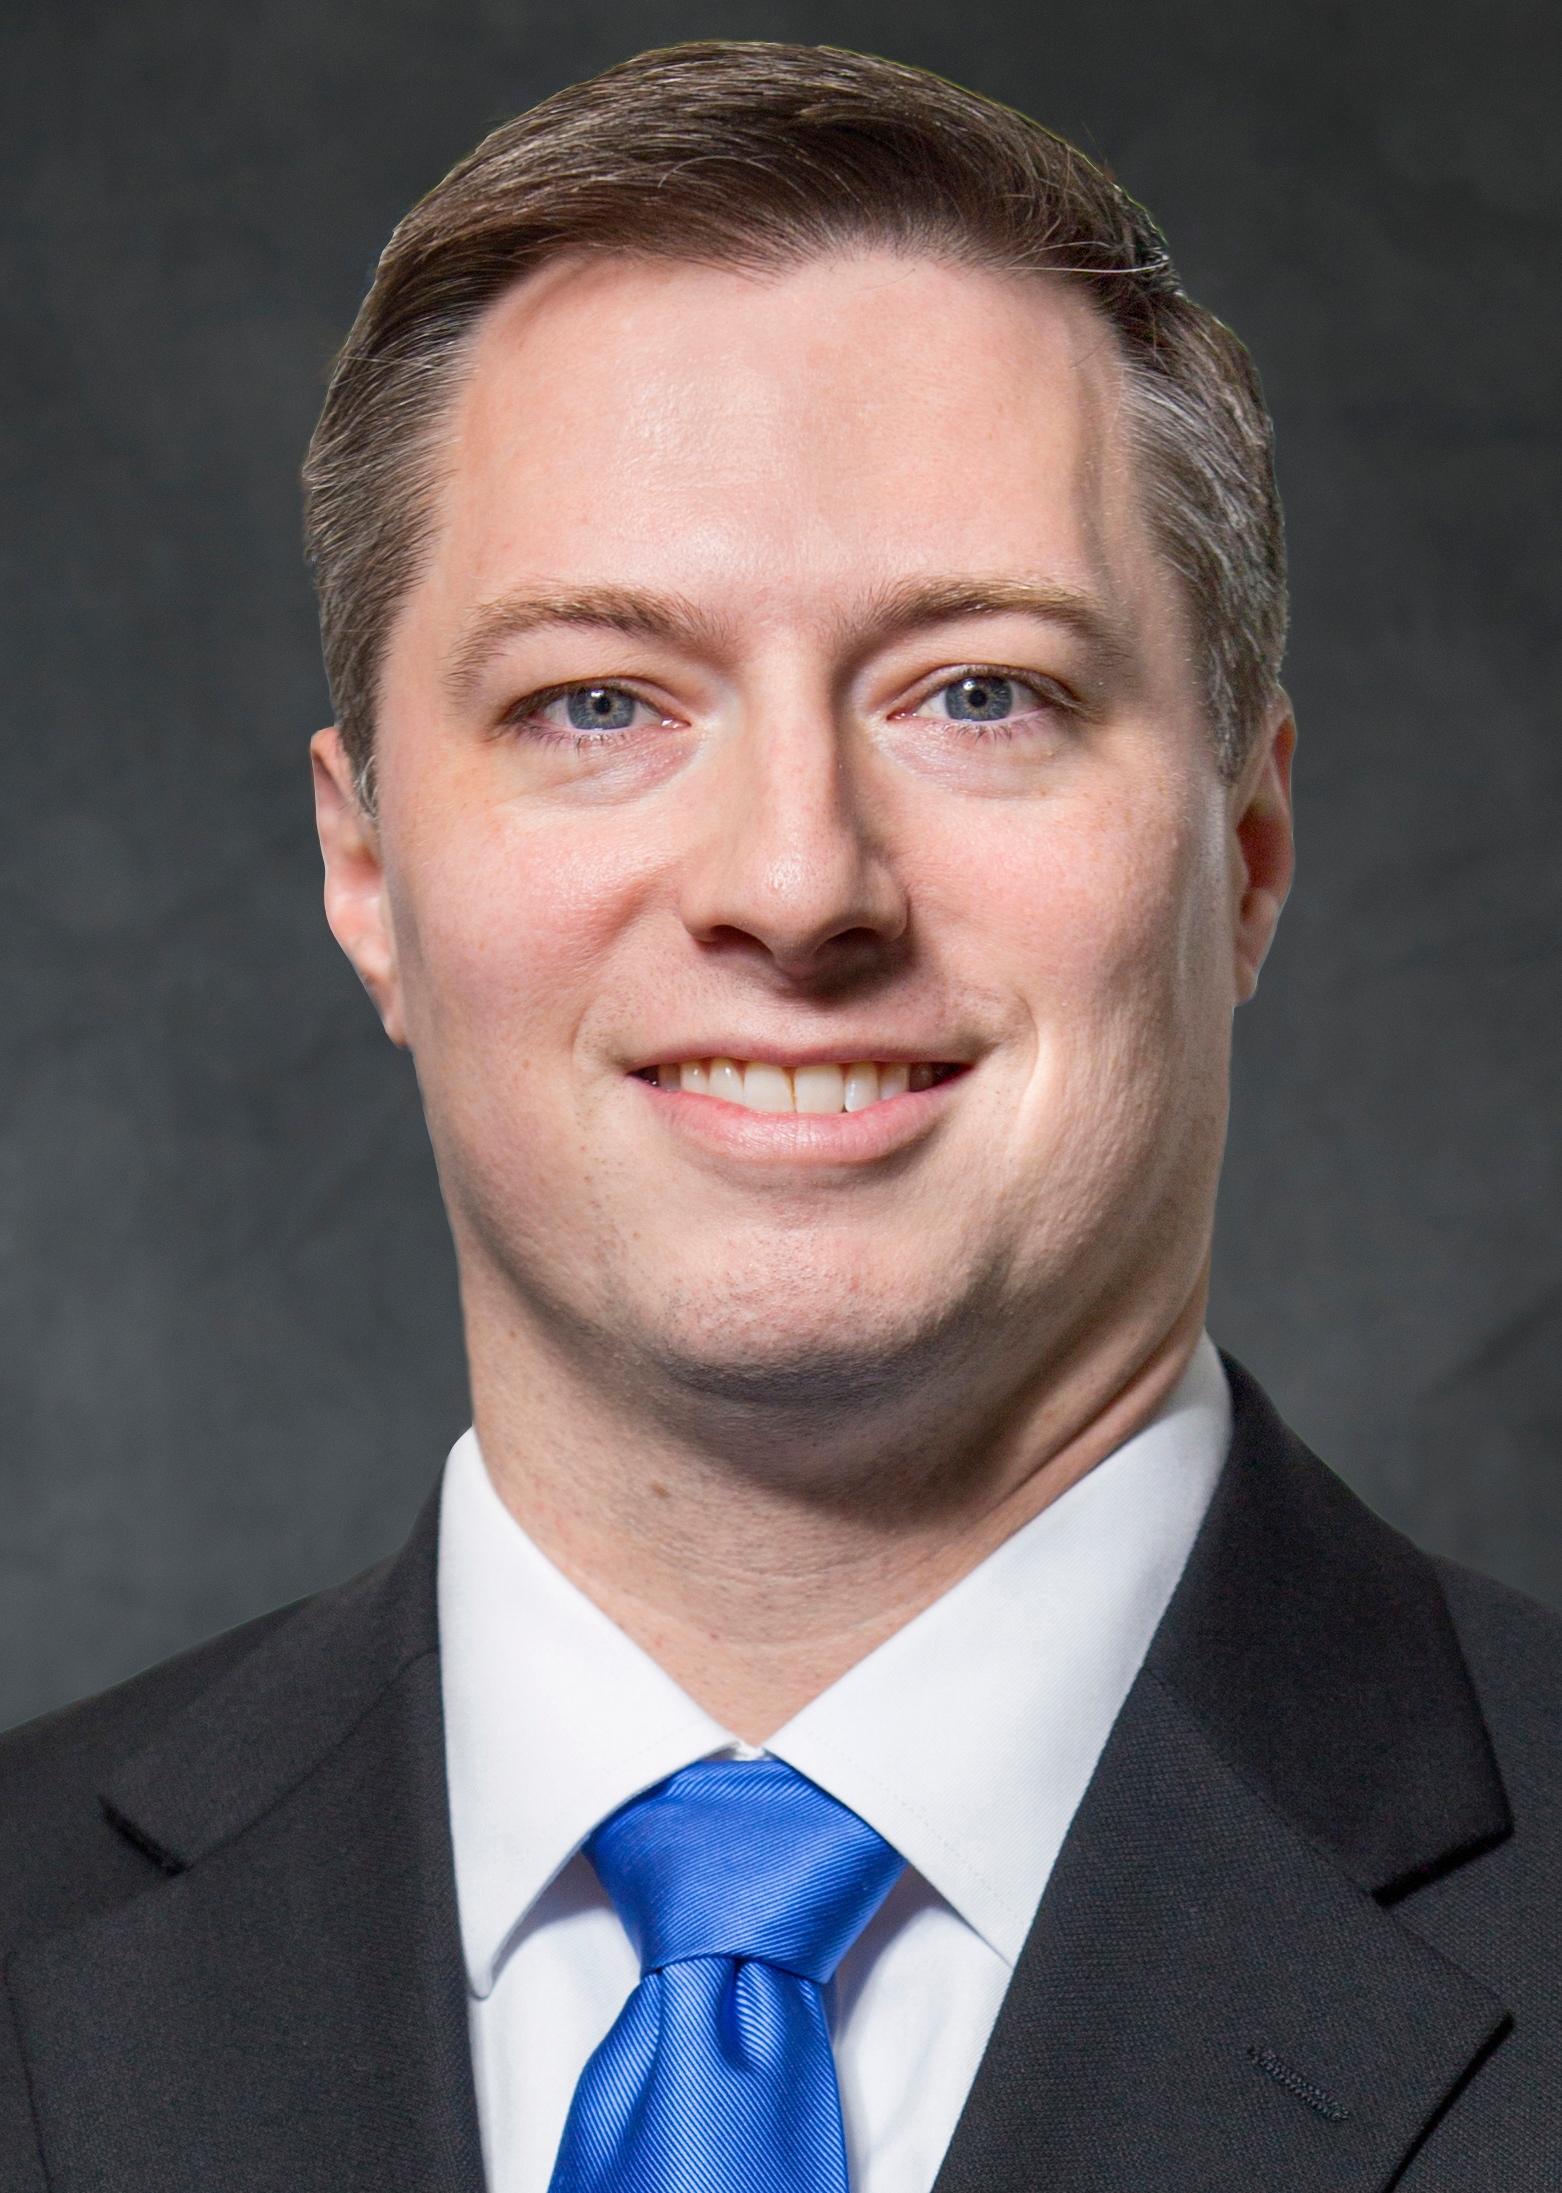 Andrew Vanderhorst, CFA, CAIA, CFP®